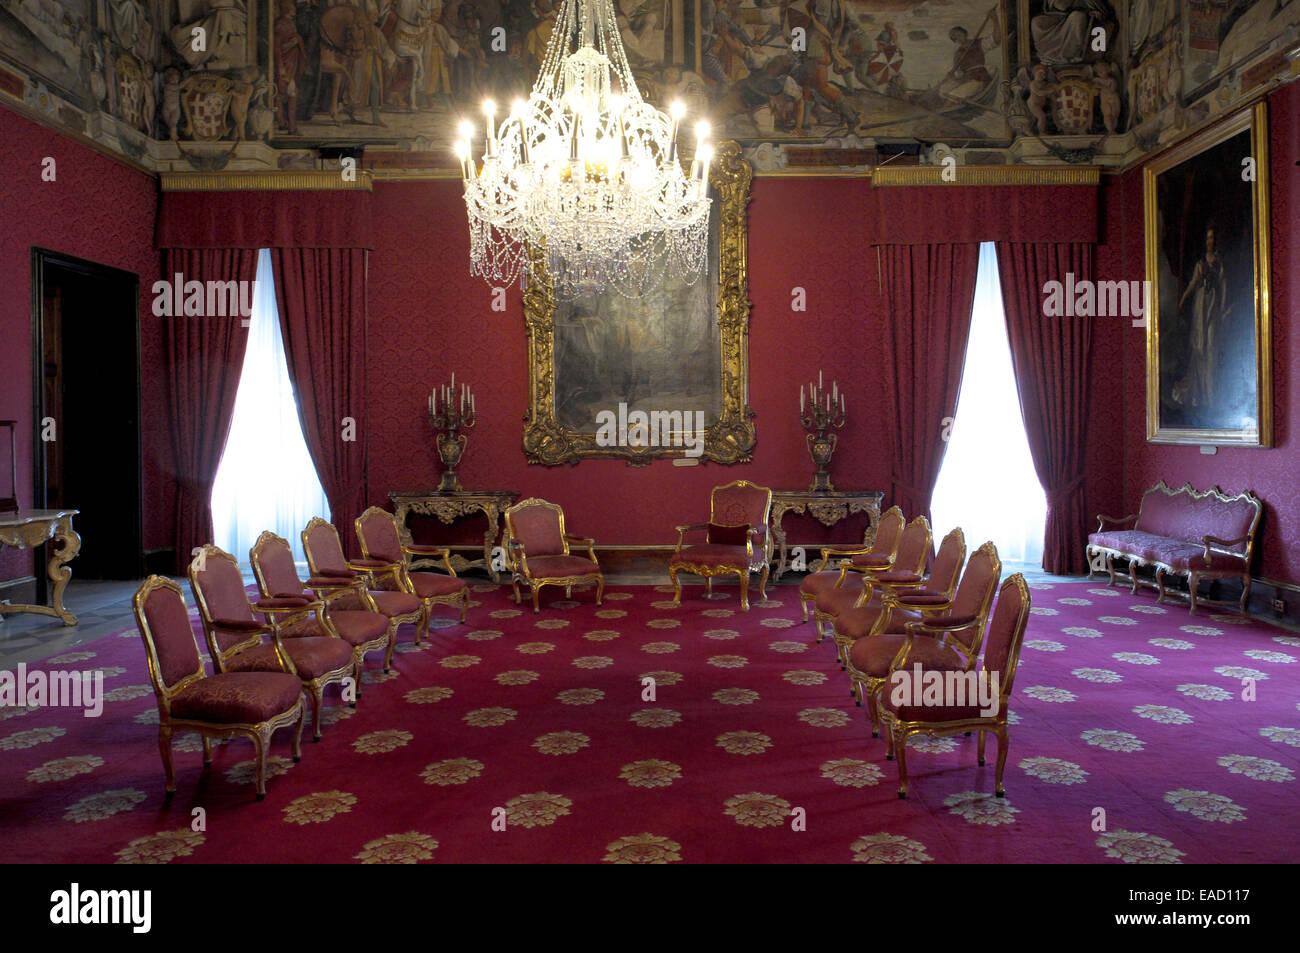 Ambassador's Room, Grandmaster's Palace, Valletta, Malta - Stock Image